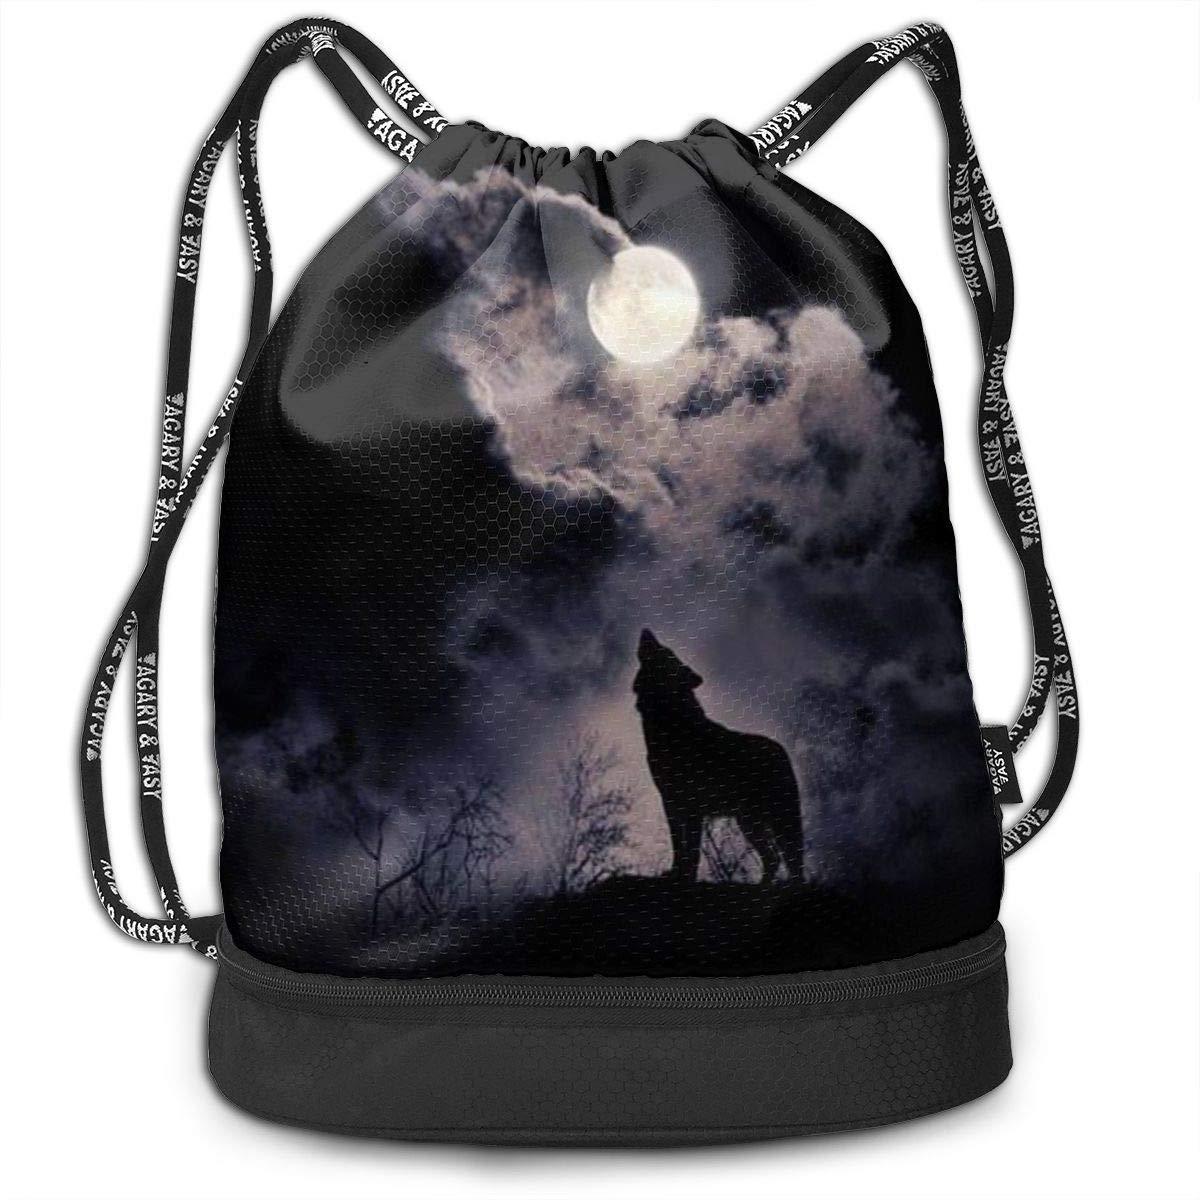 ewtretr Bolsos De Gimnasio Wolf Multifunctional Bundle Backpack Shoulder Bag For Men and Women